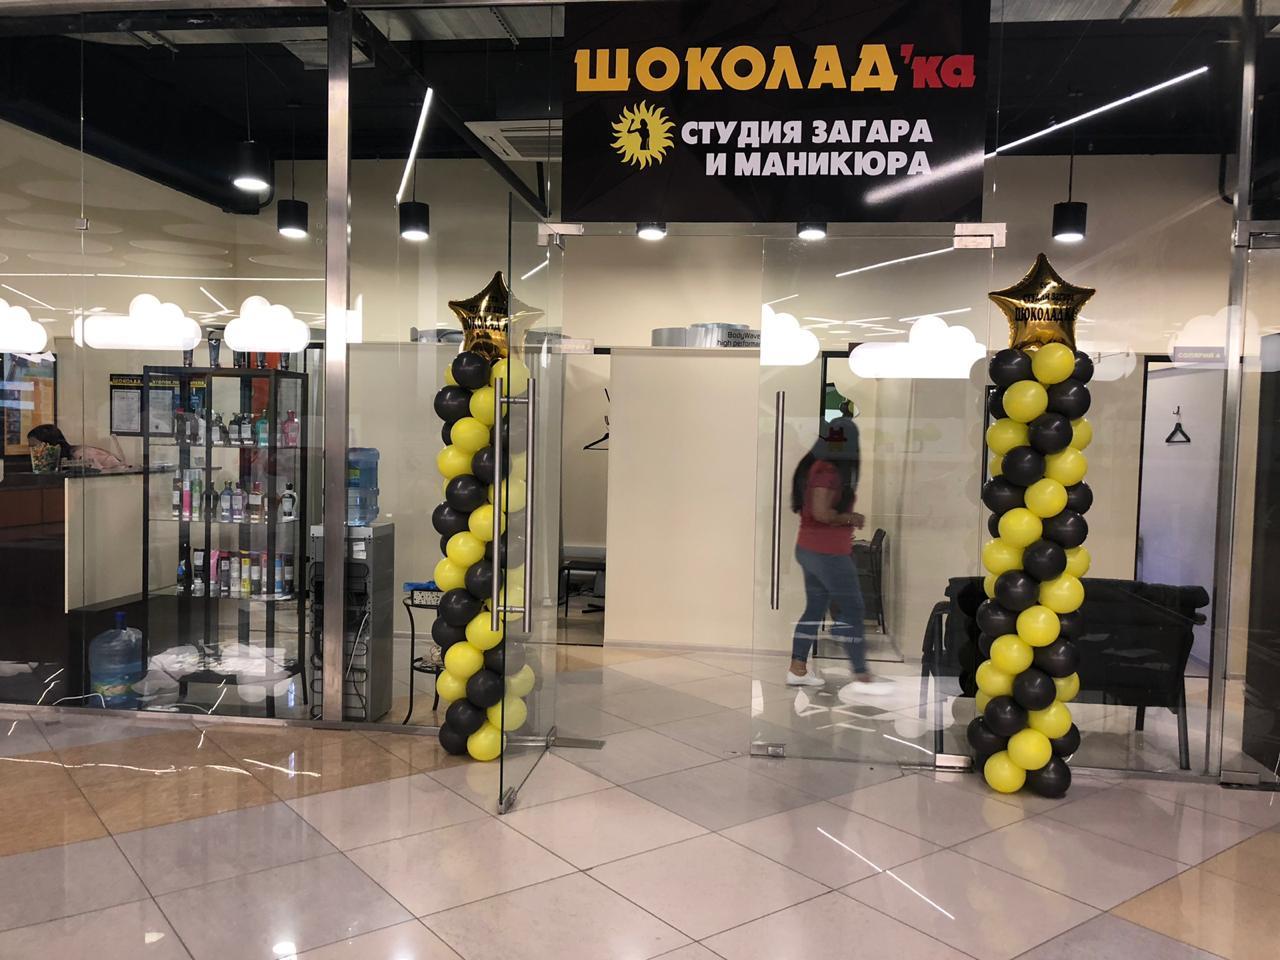 spa студия загара и красоты ТЦ Праздничный (52-91-31)